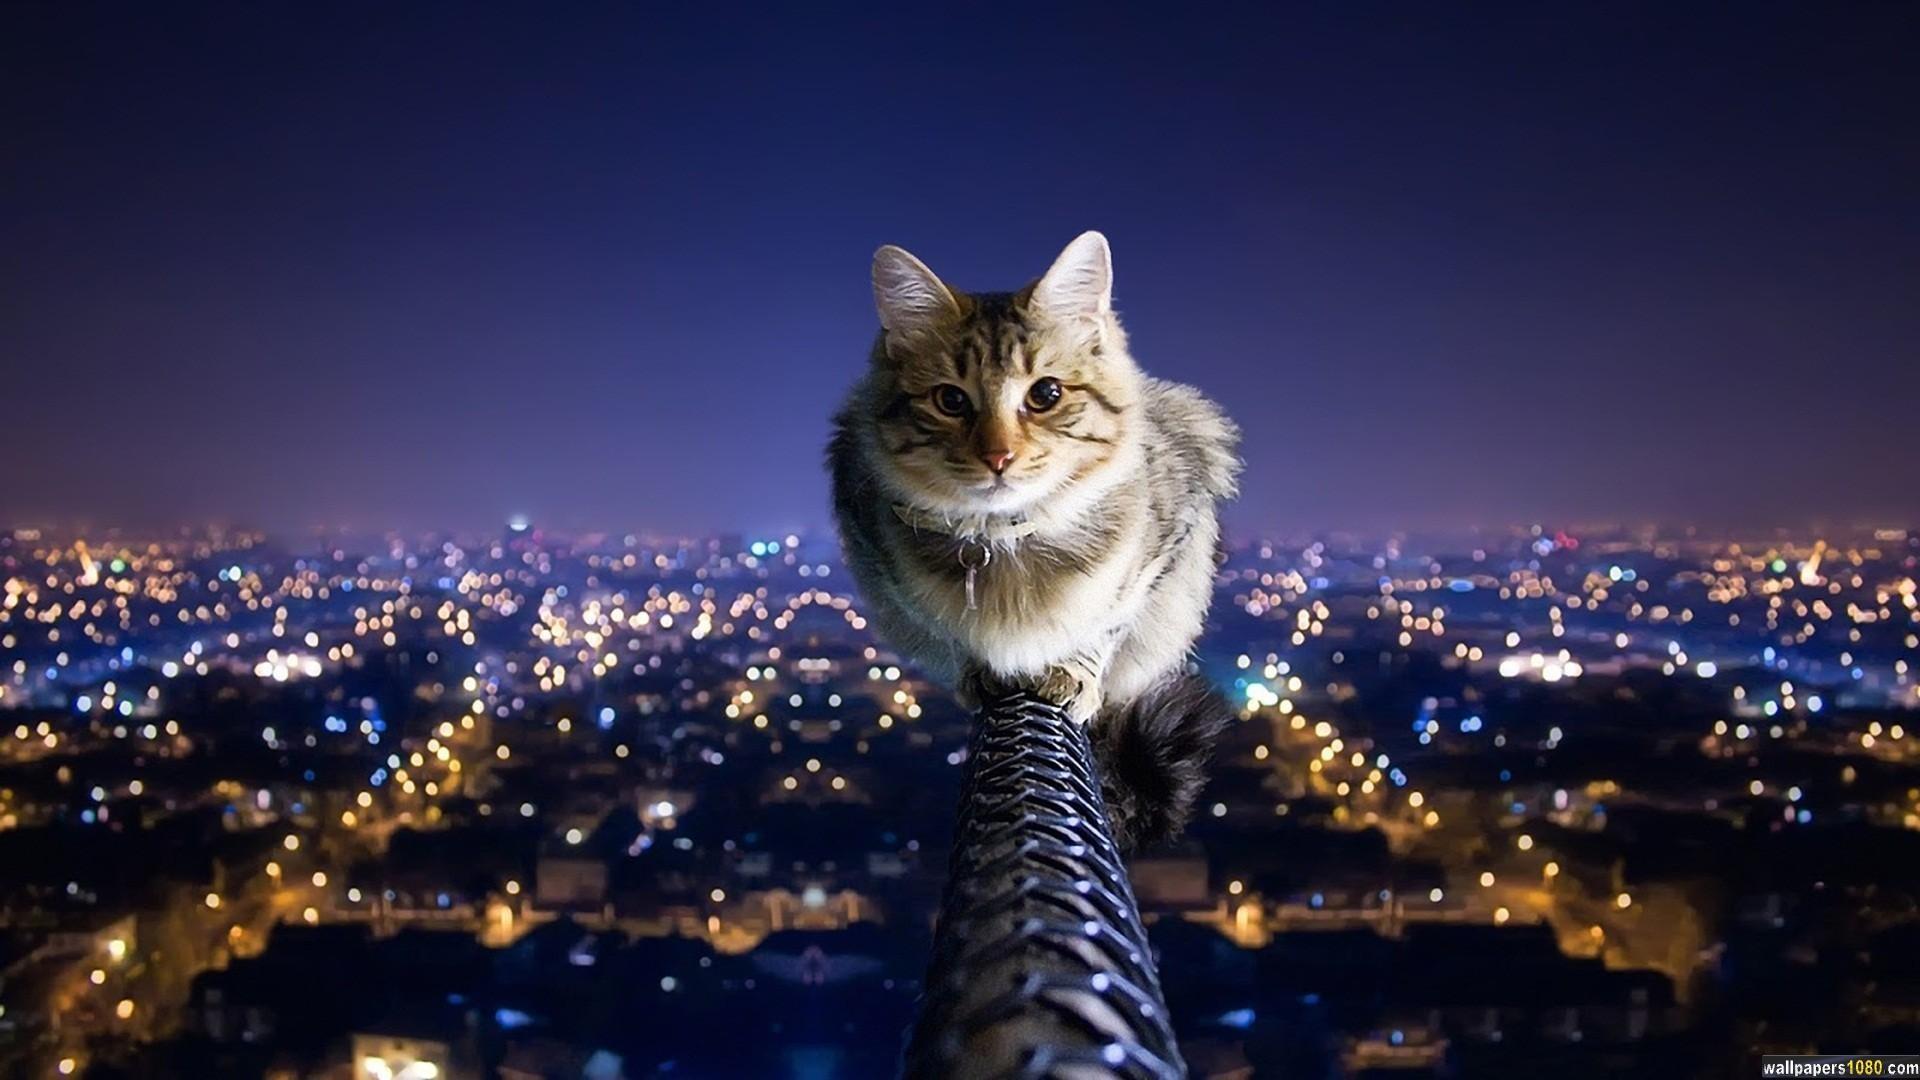 Cat Animal Windows 10 Wallpaper | 1080p Wallpapers, Hd Wallpapers .